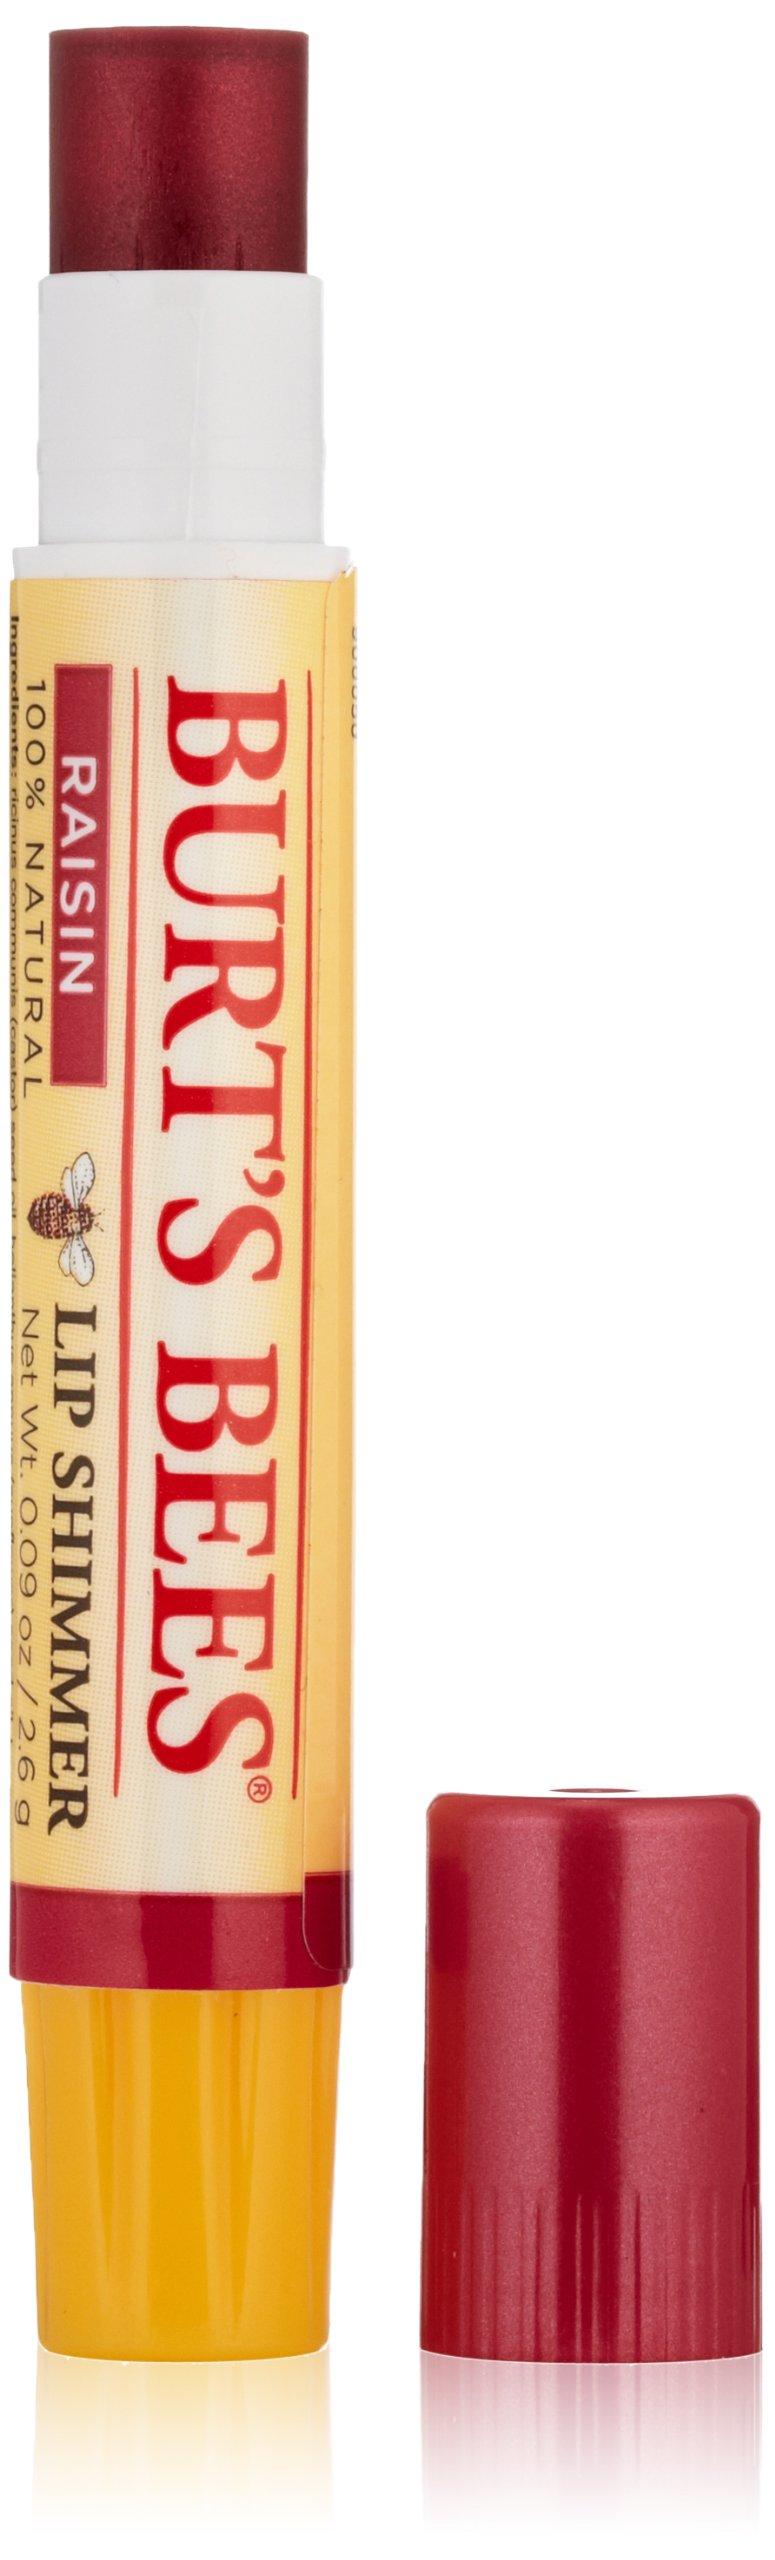 Burt's Bees 100% Natural Moisturizing Lip Shimmer, Raisin - 4 Tubes